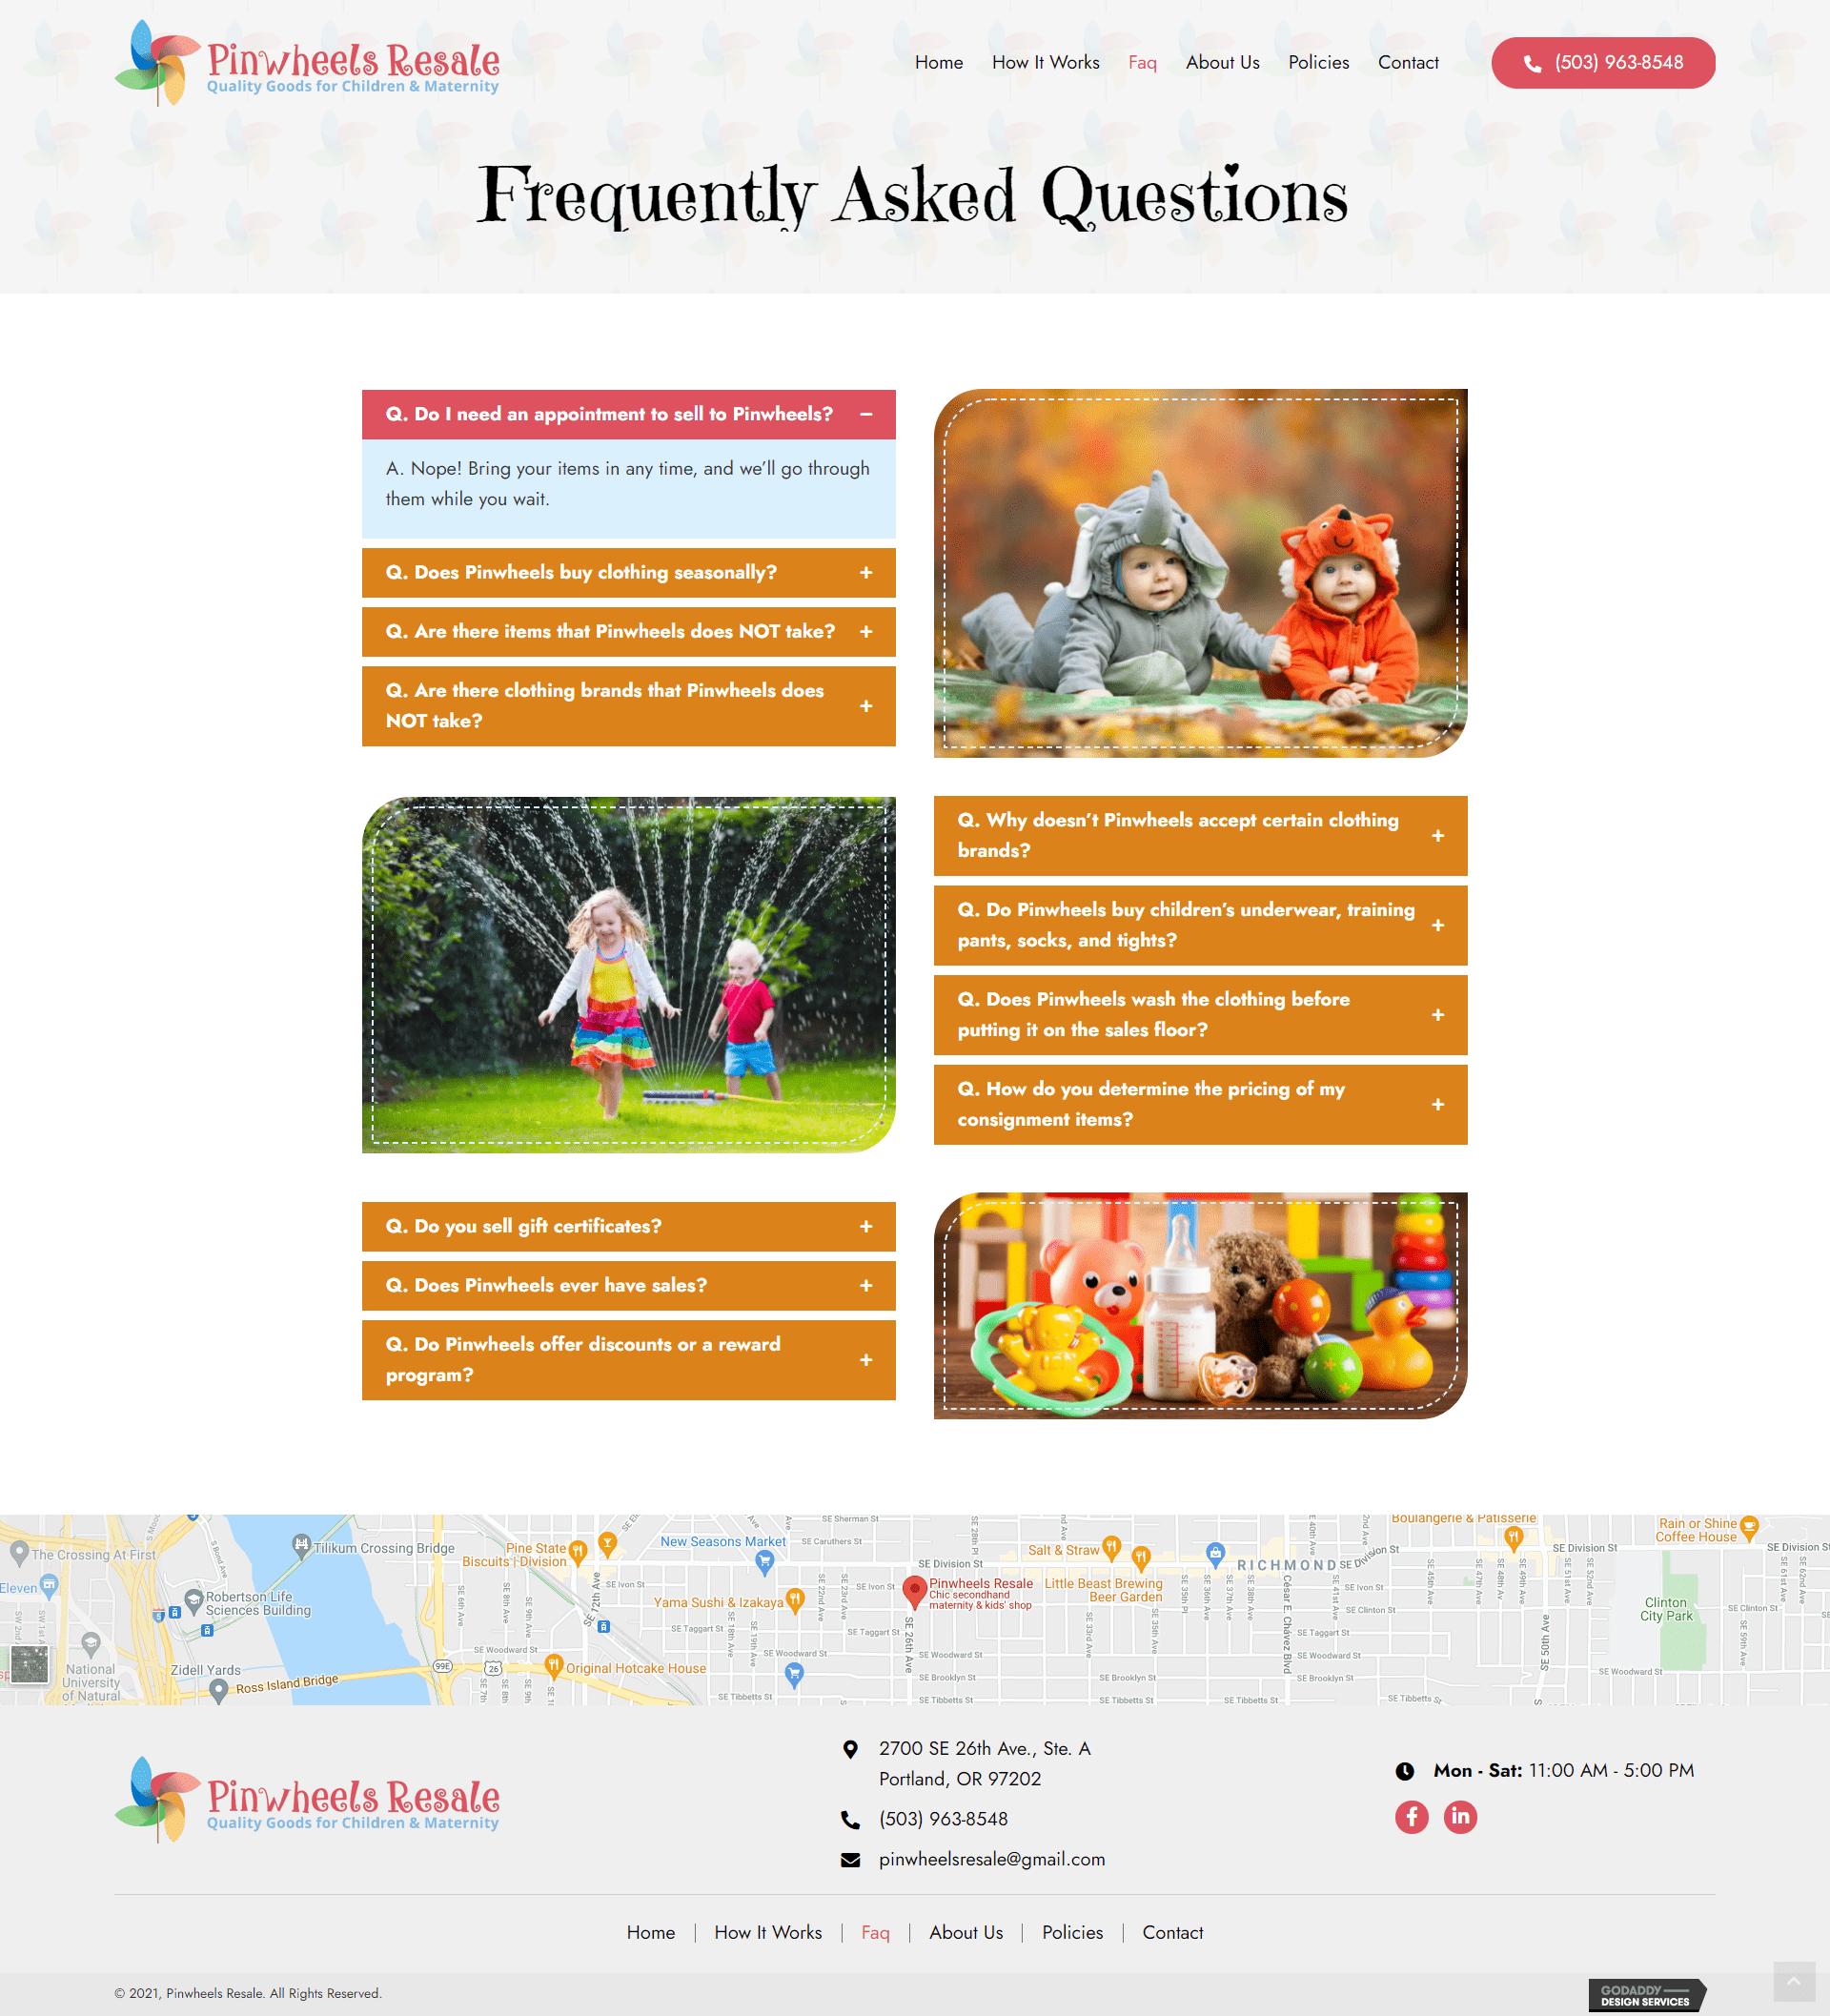 Pinwheels Resale FAQ